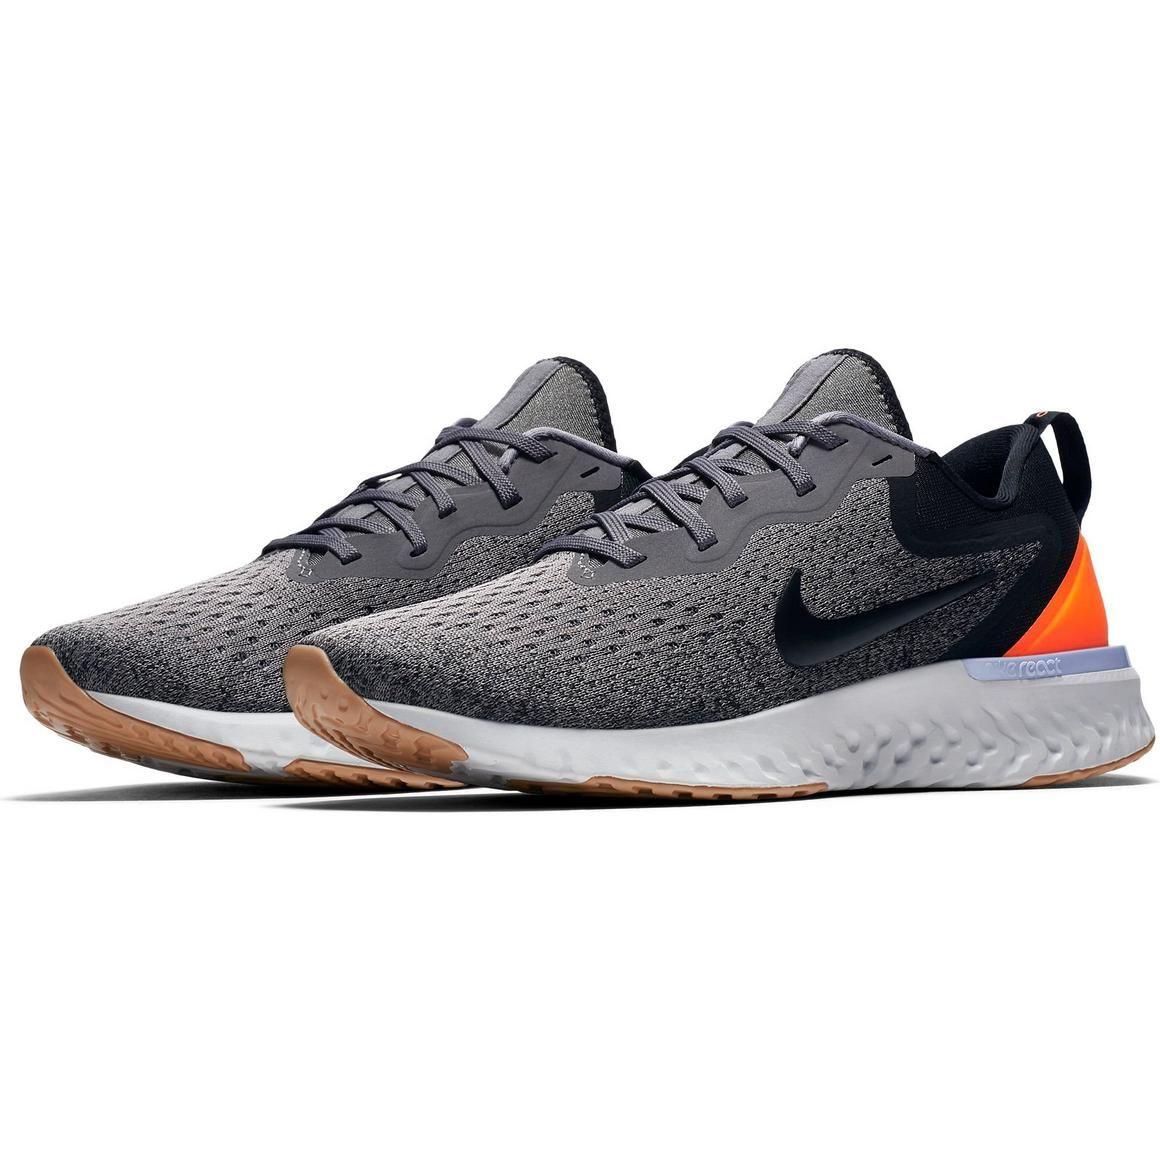 quality design 1185f 9f520 Nike Air Max 98 2019